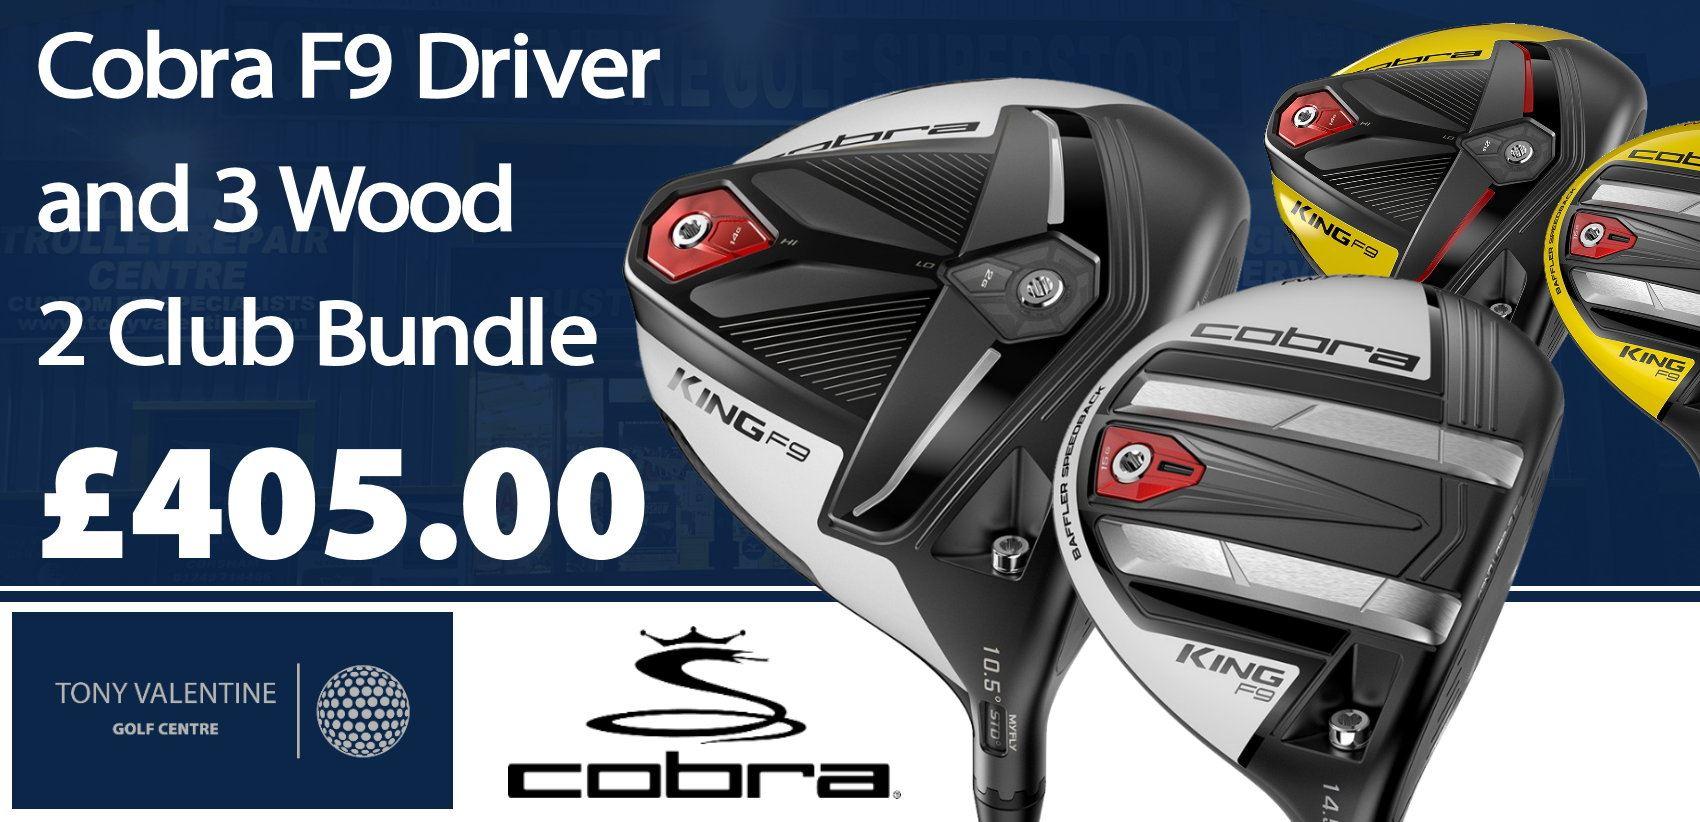 Cobra F9 Driver and 3 Wood, 2 Club Bundle